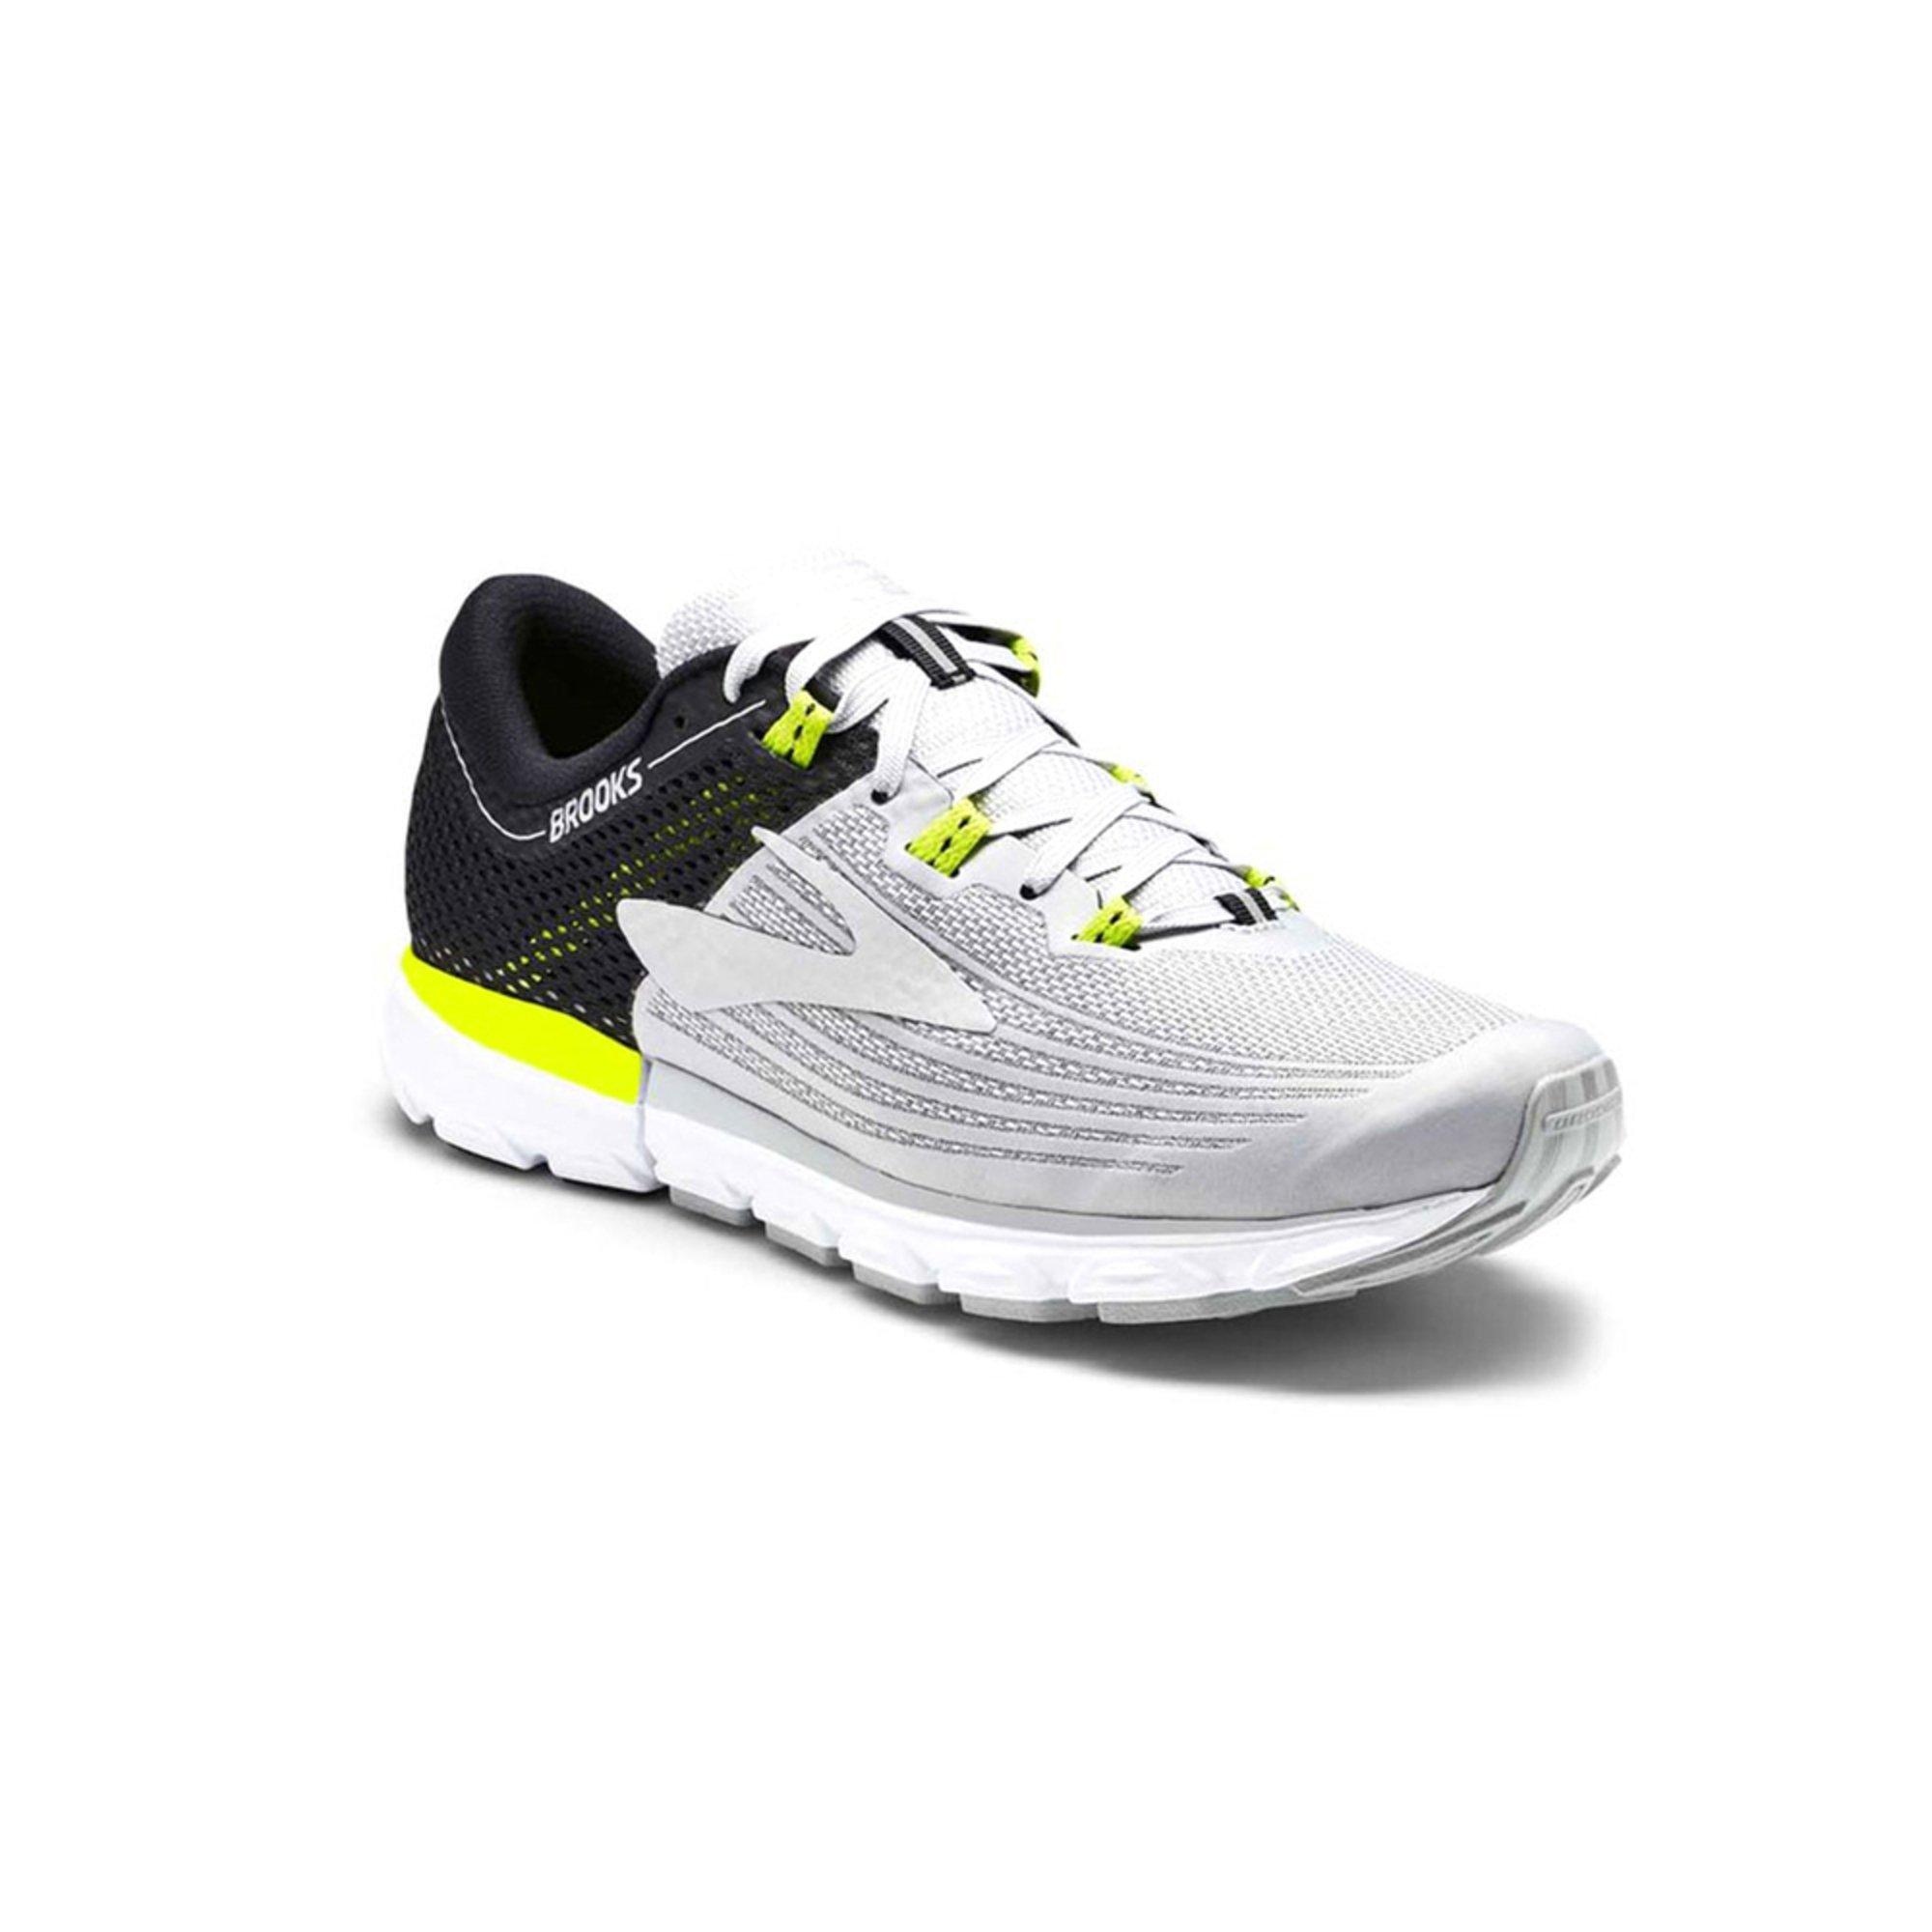 727606826d4 Brooks. Brooks Men s Neuro Running Shoe